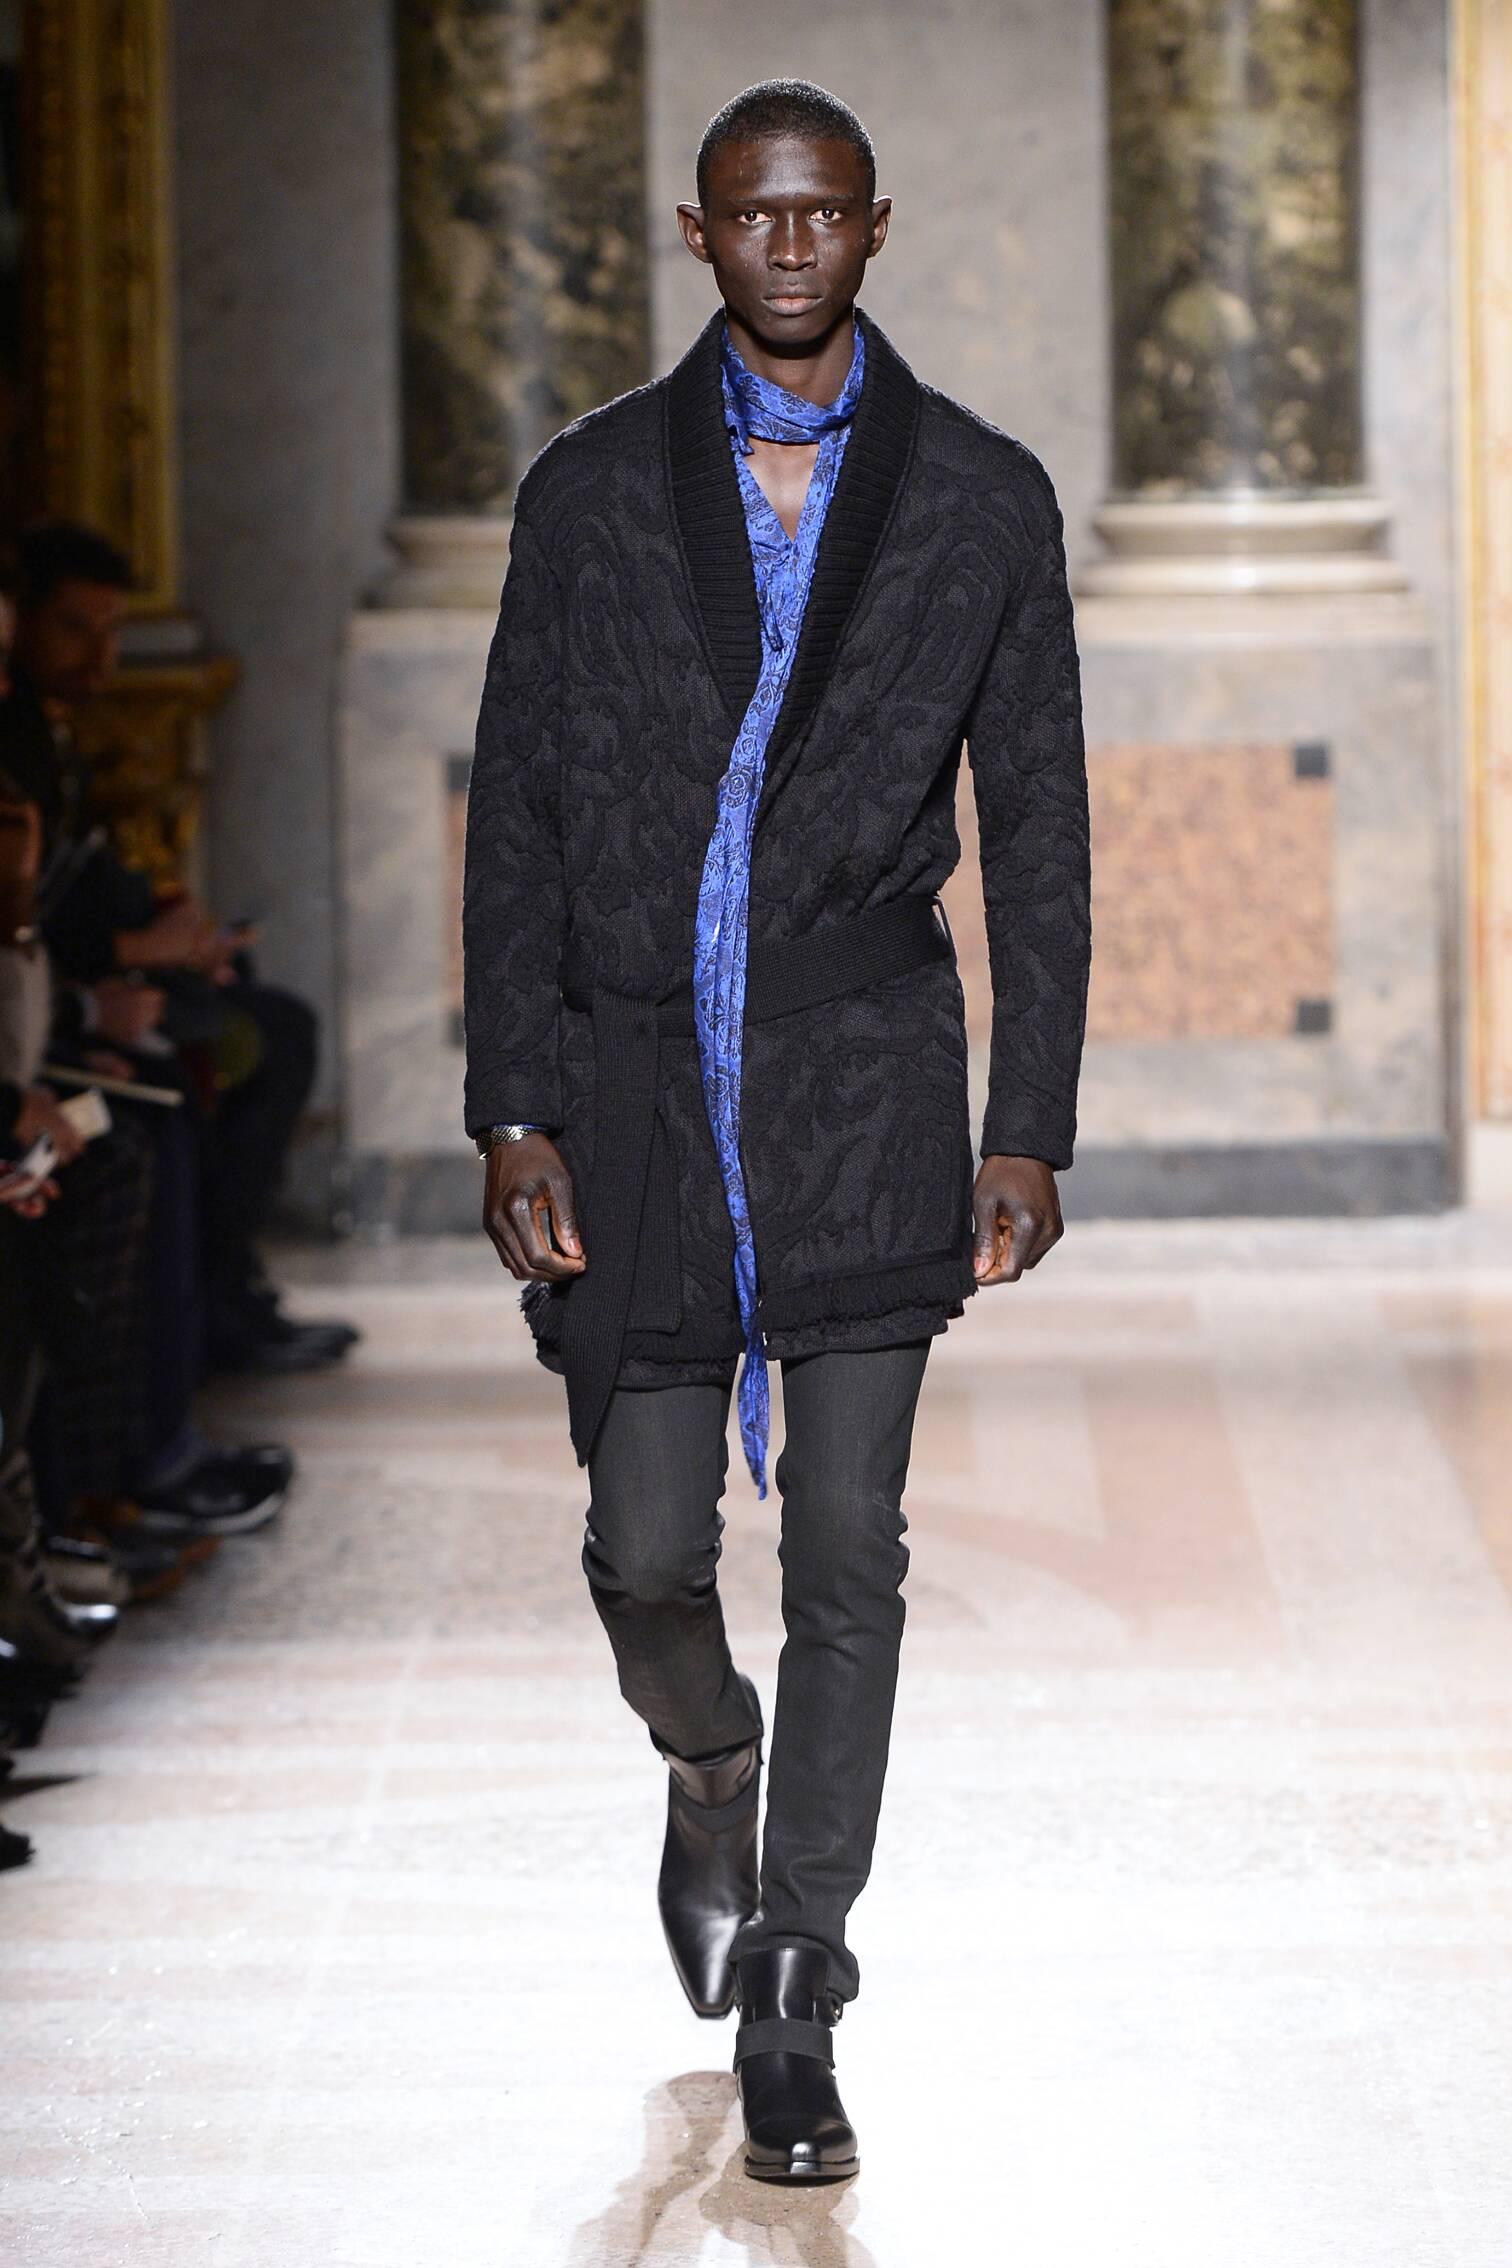 Roberto Cavalli Fall Winter 2015 16 Men's Collection Milan Fashion Week Fashion Show